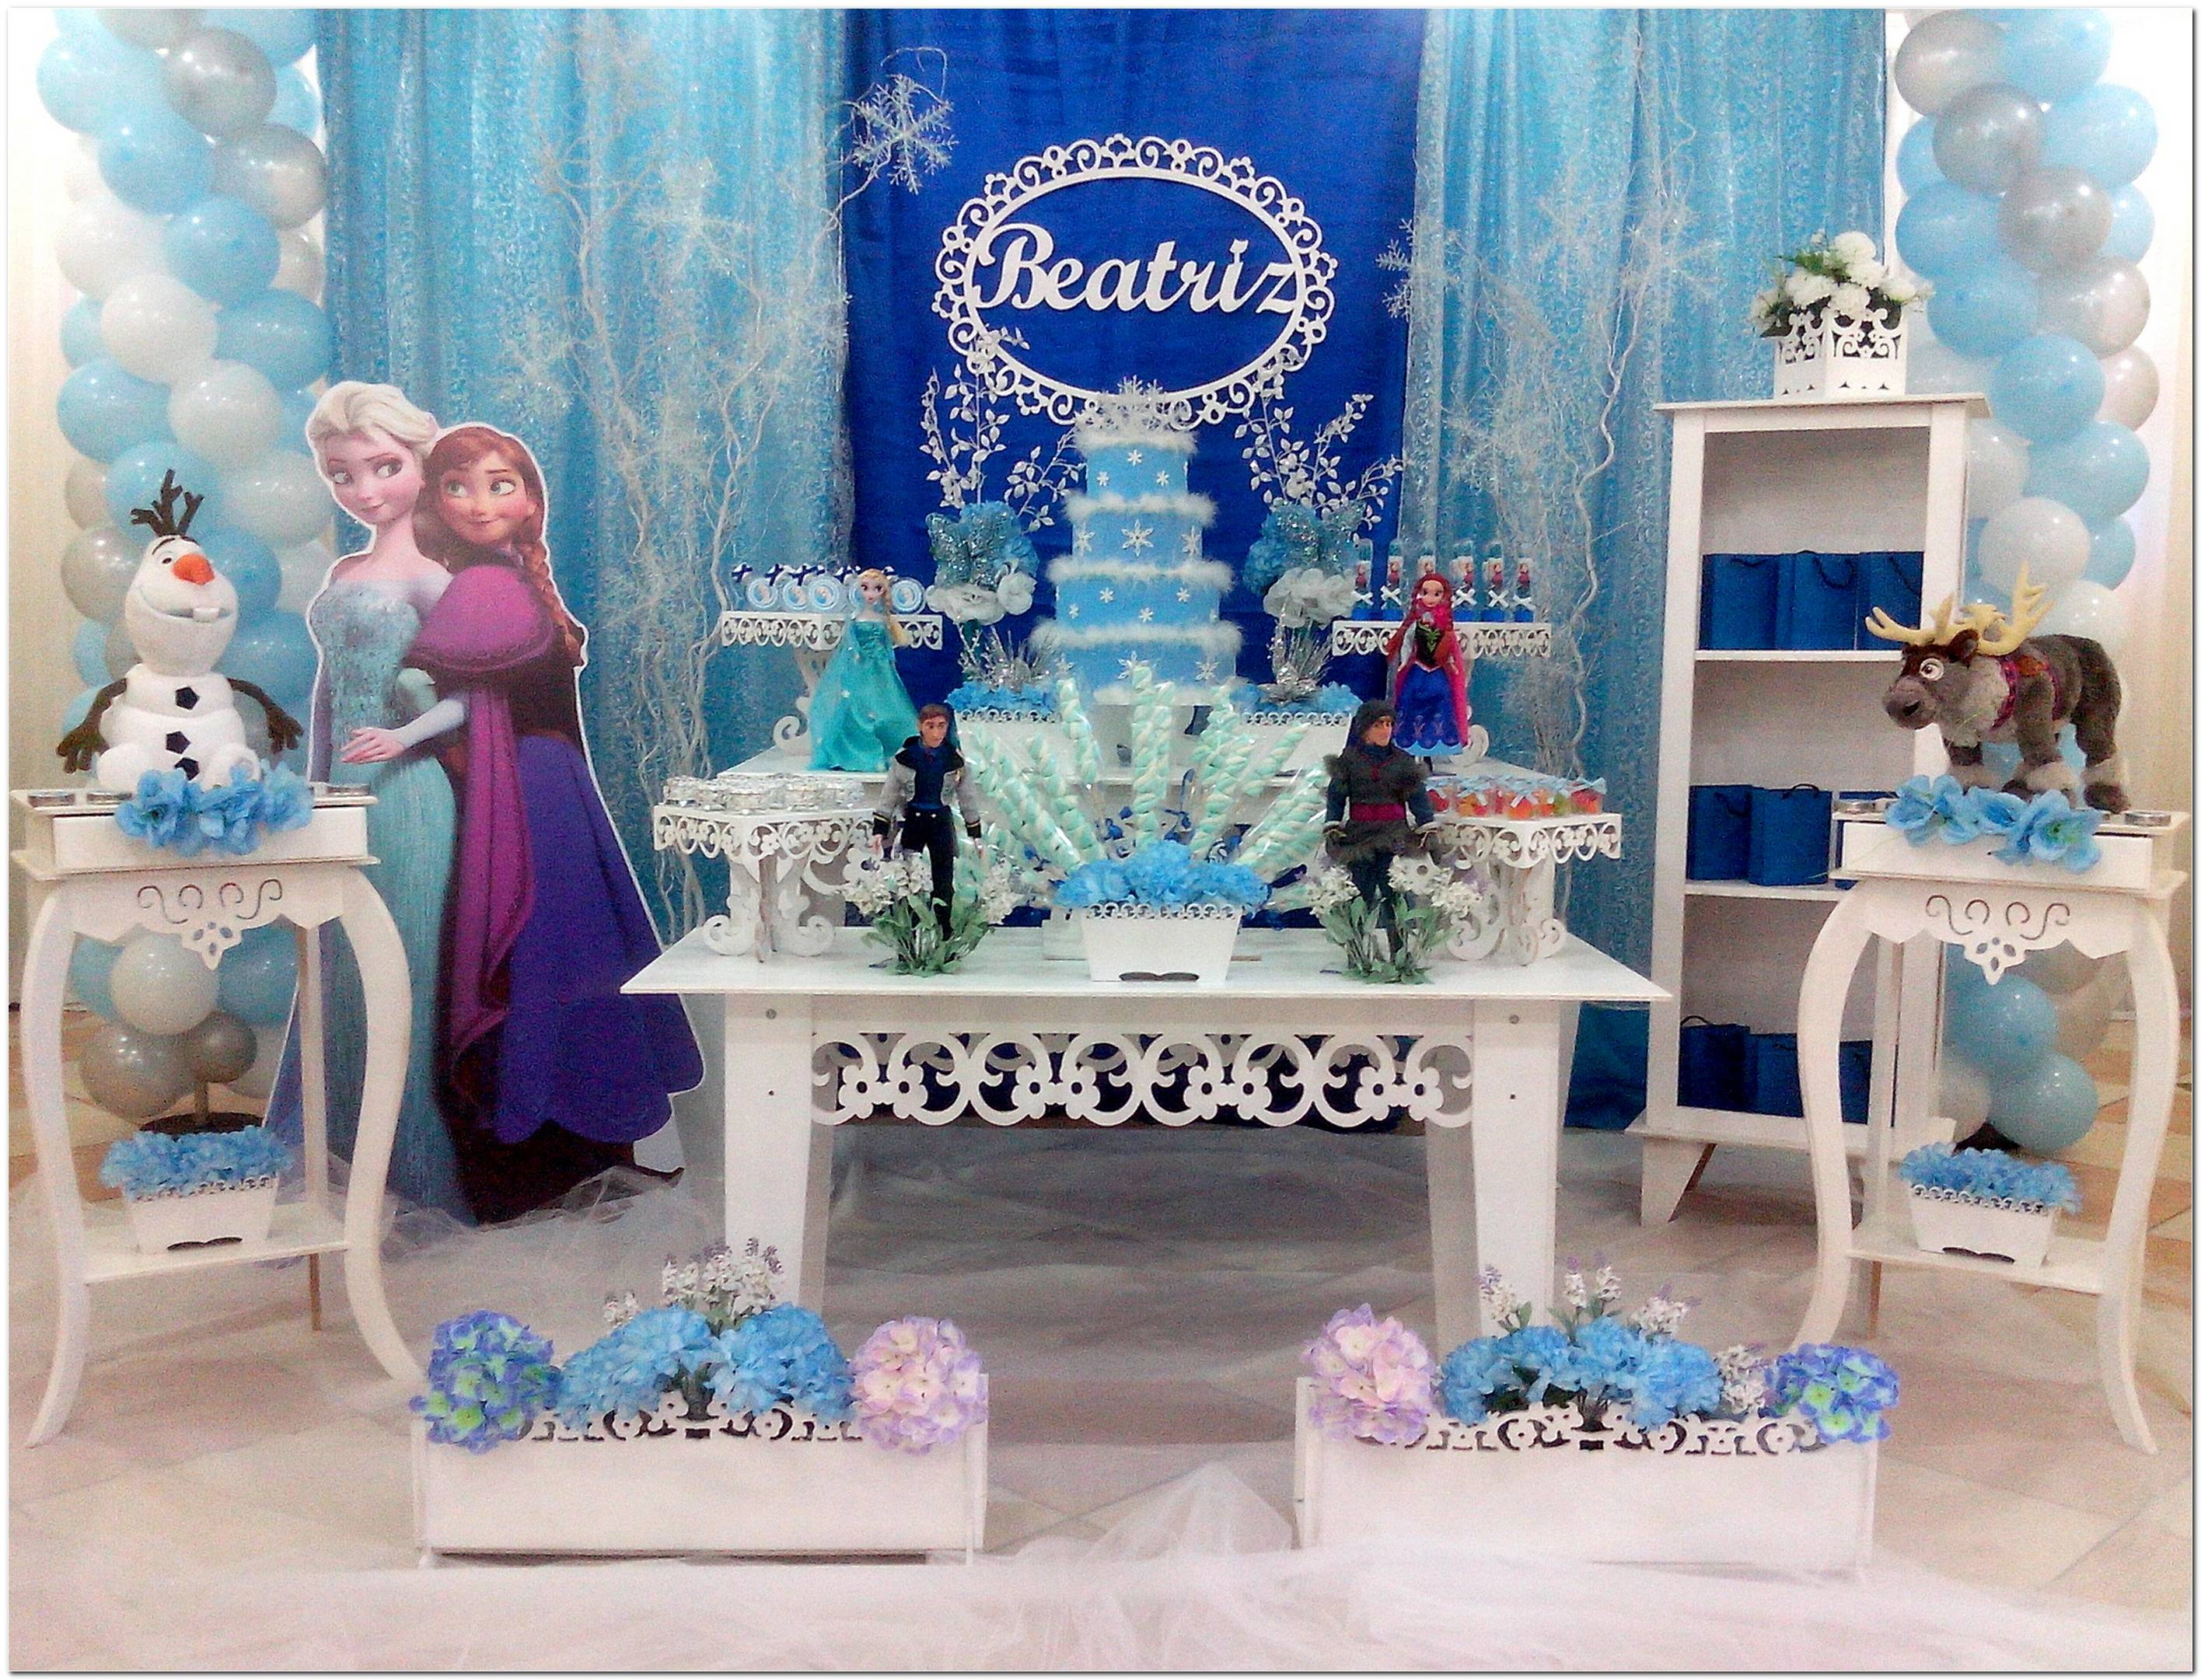 Decoração Frozen Festa Infantil